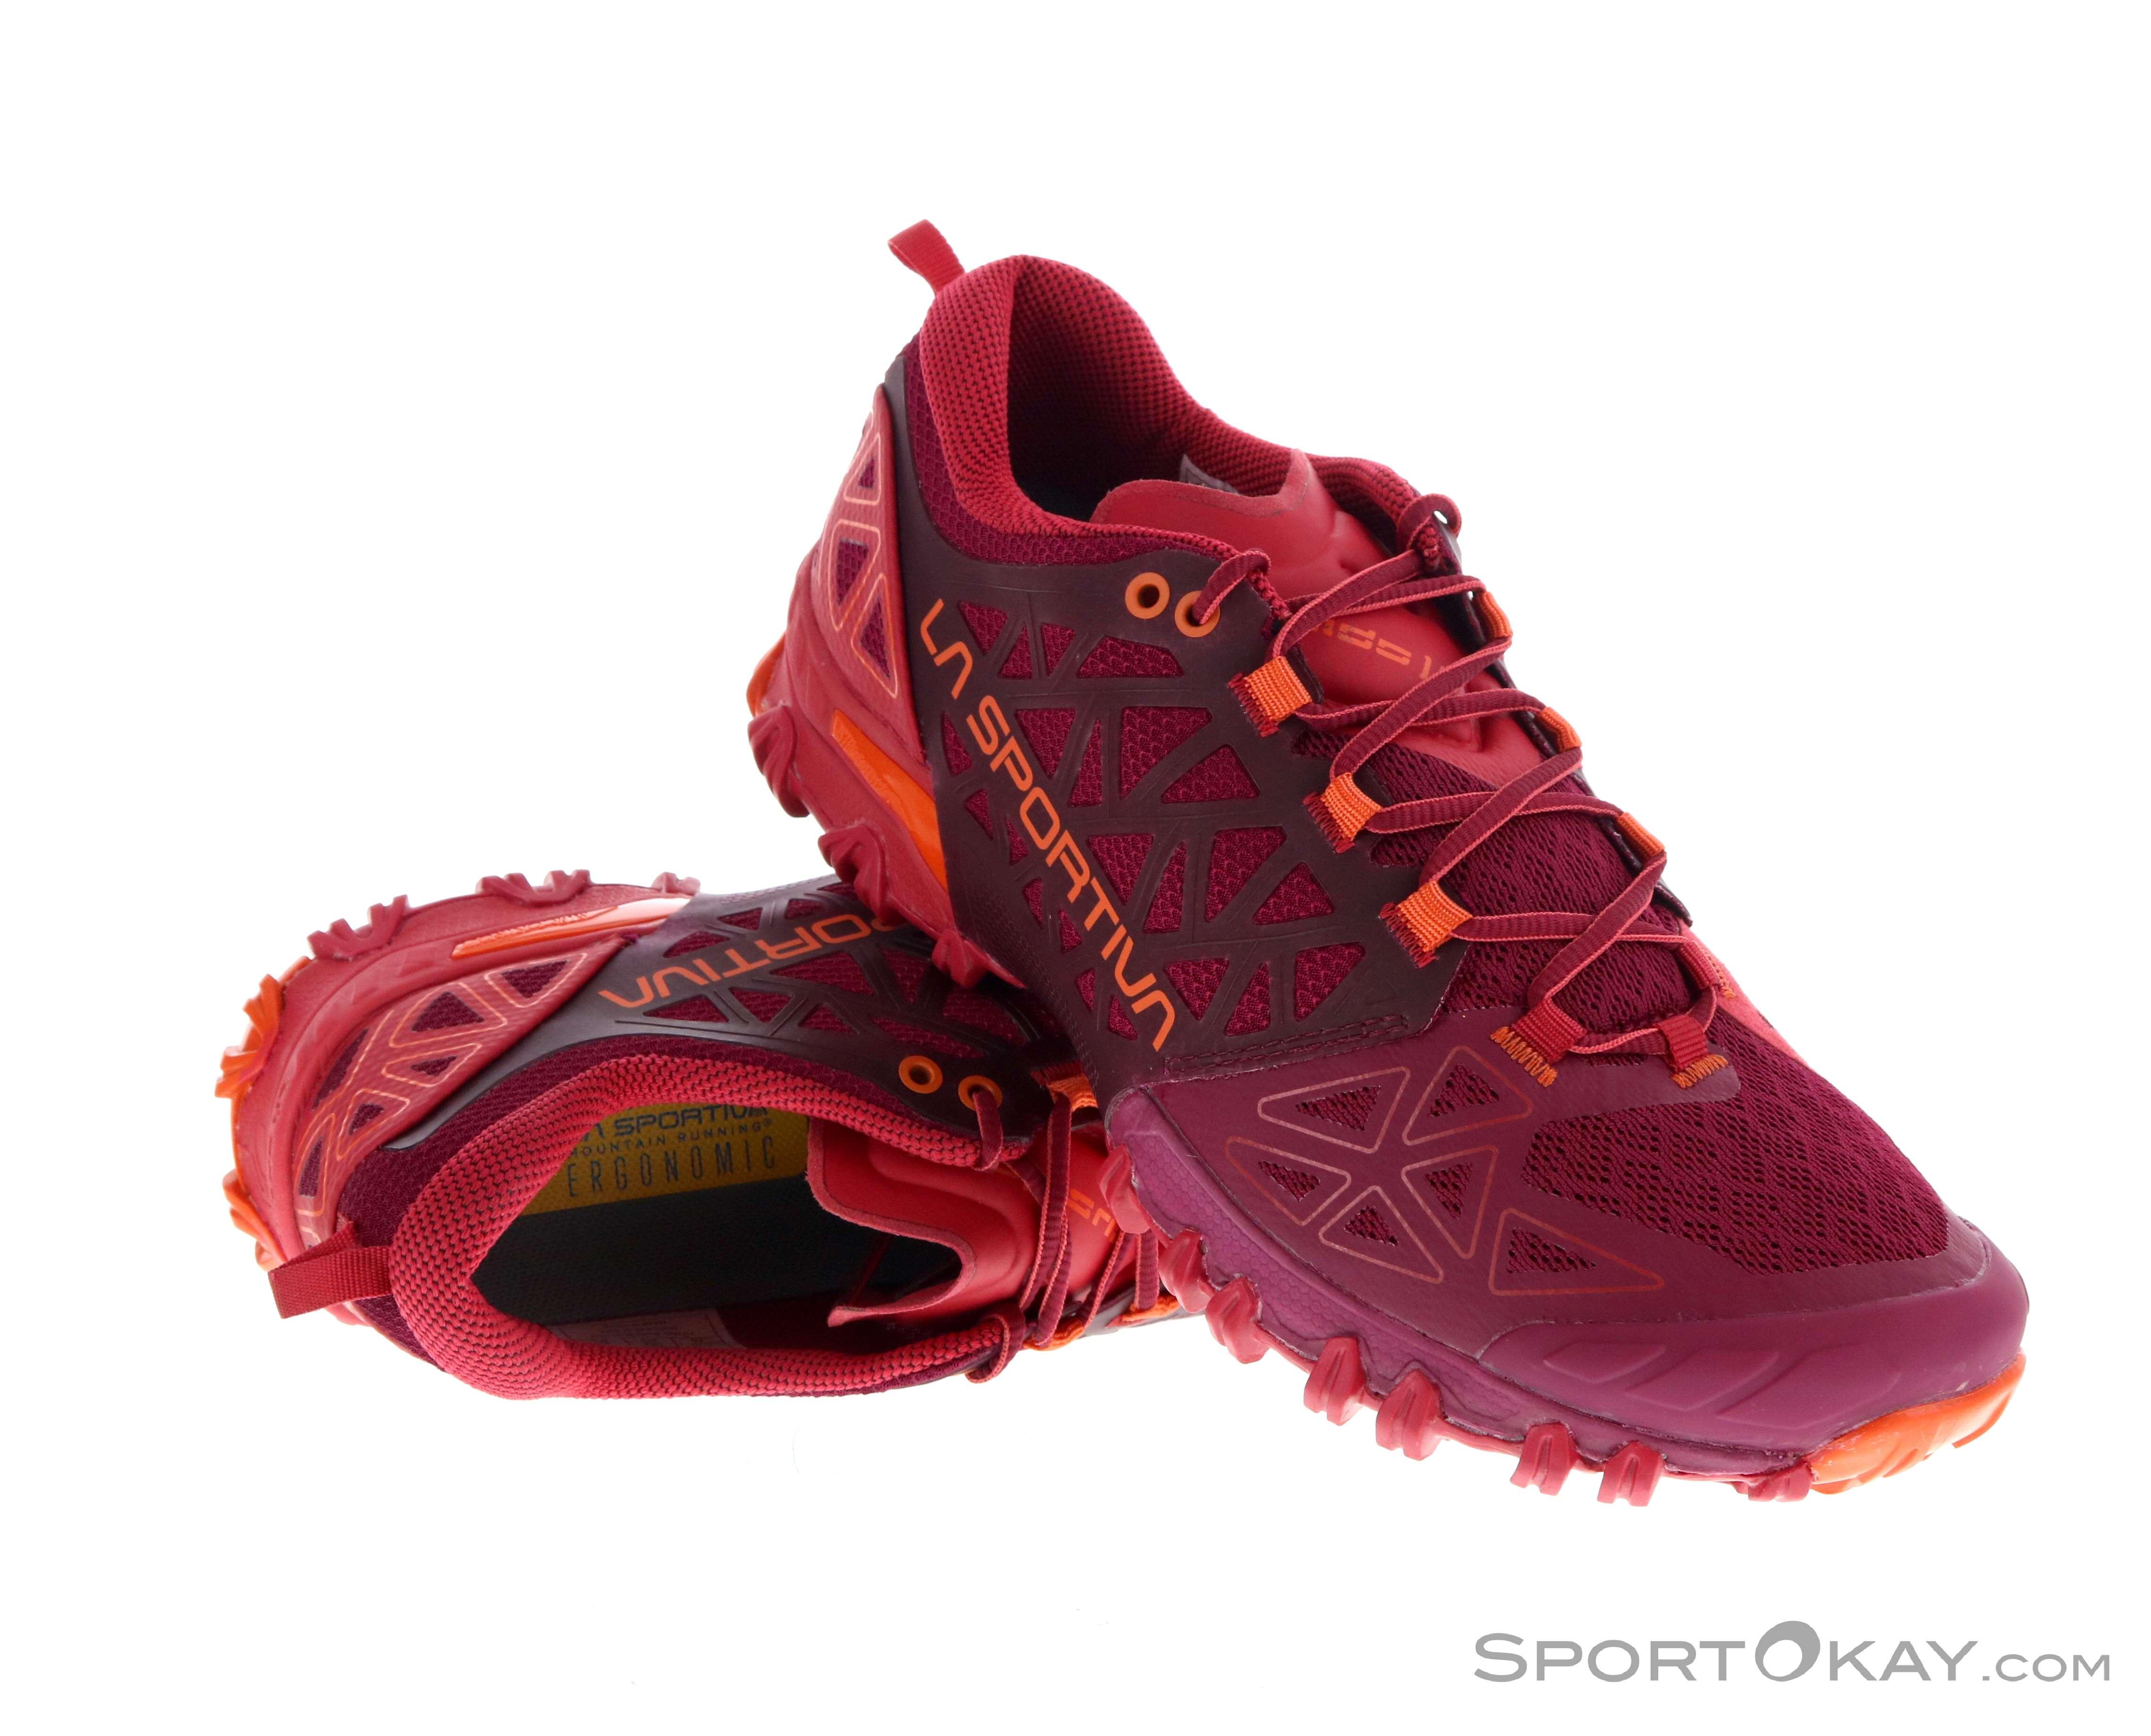 La Sportiva Bushido II Womens Trail